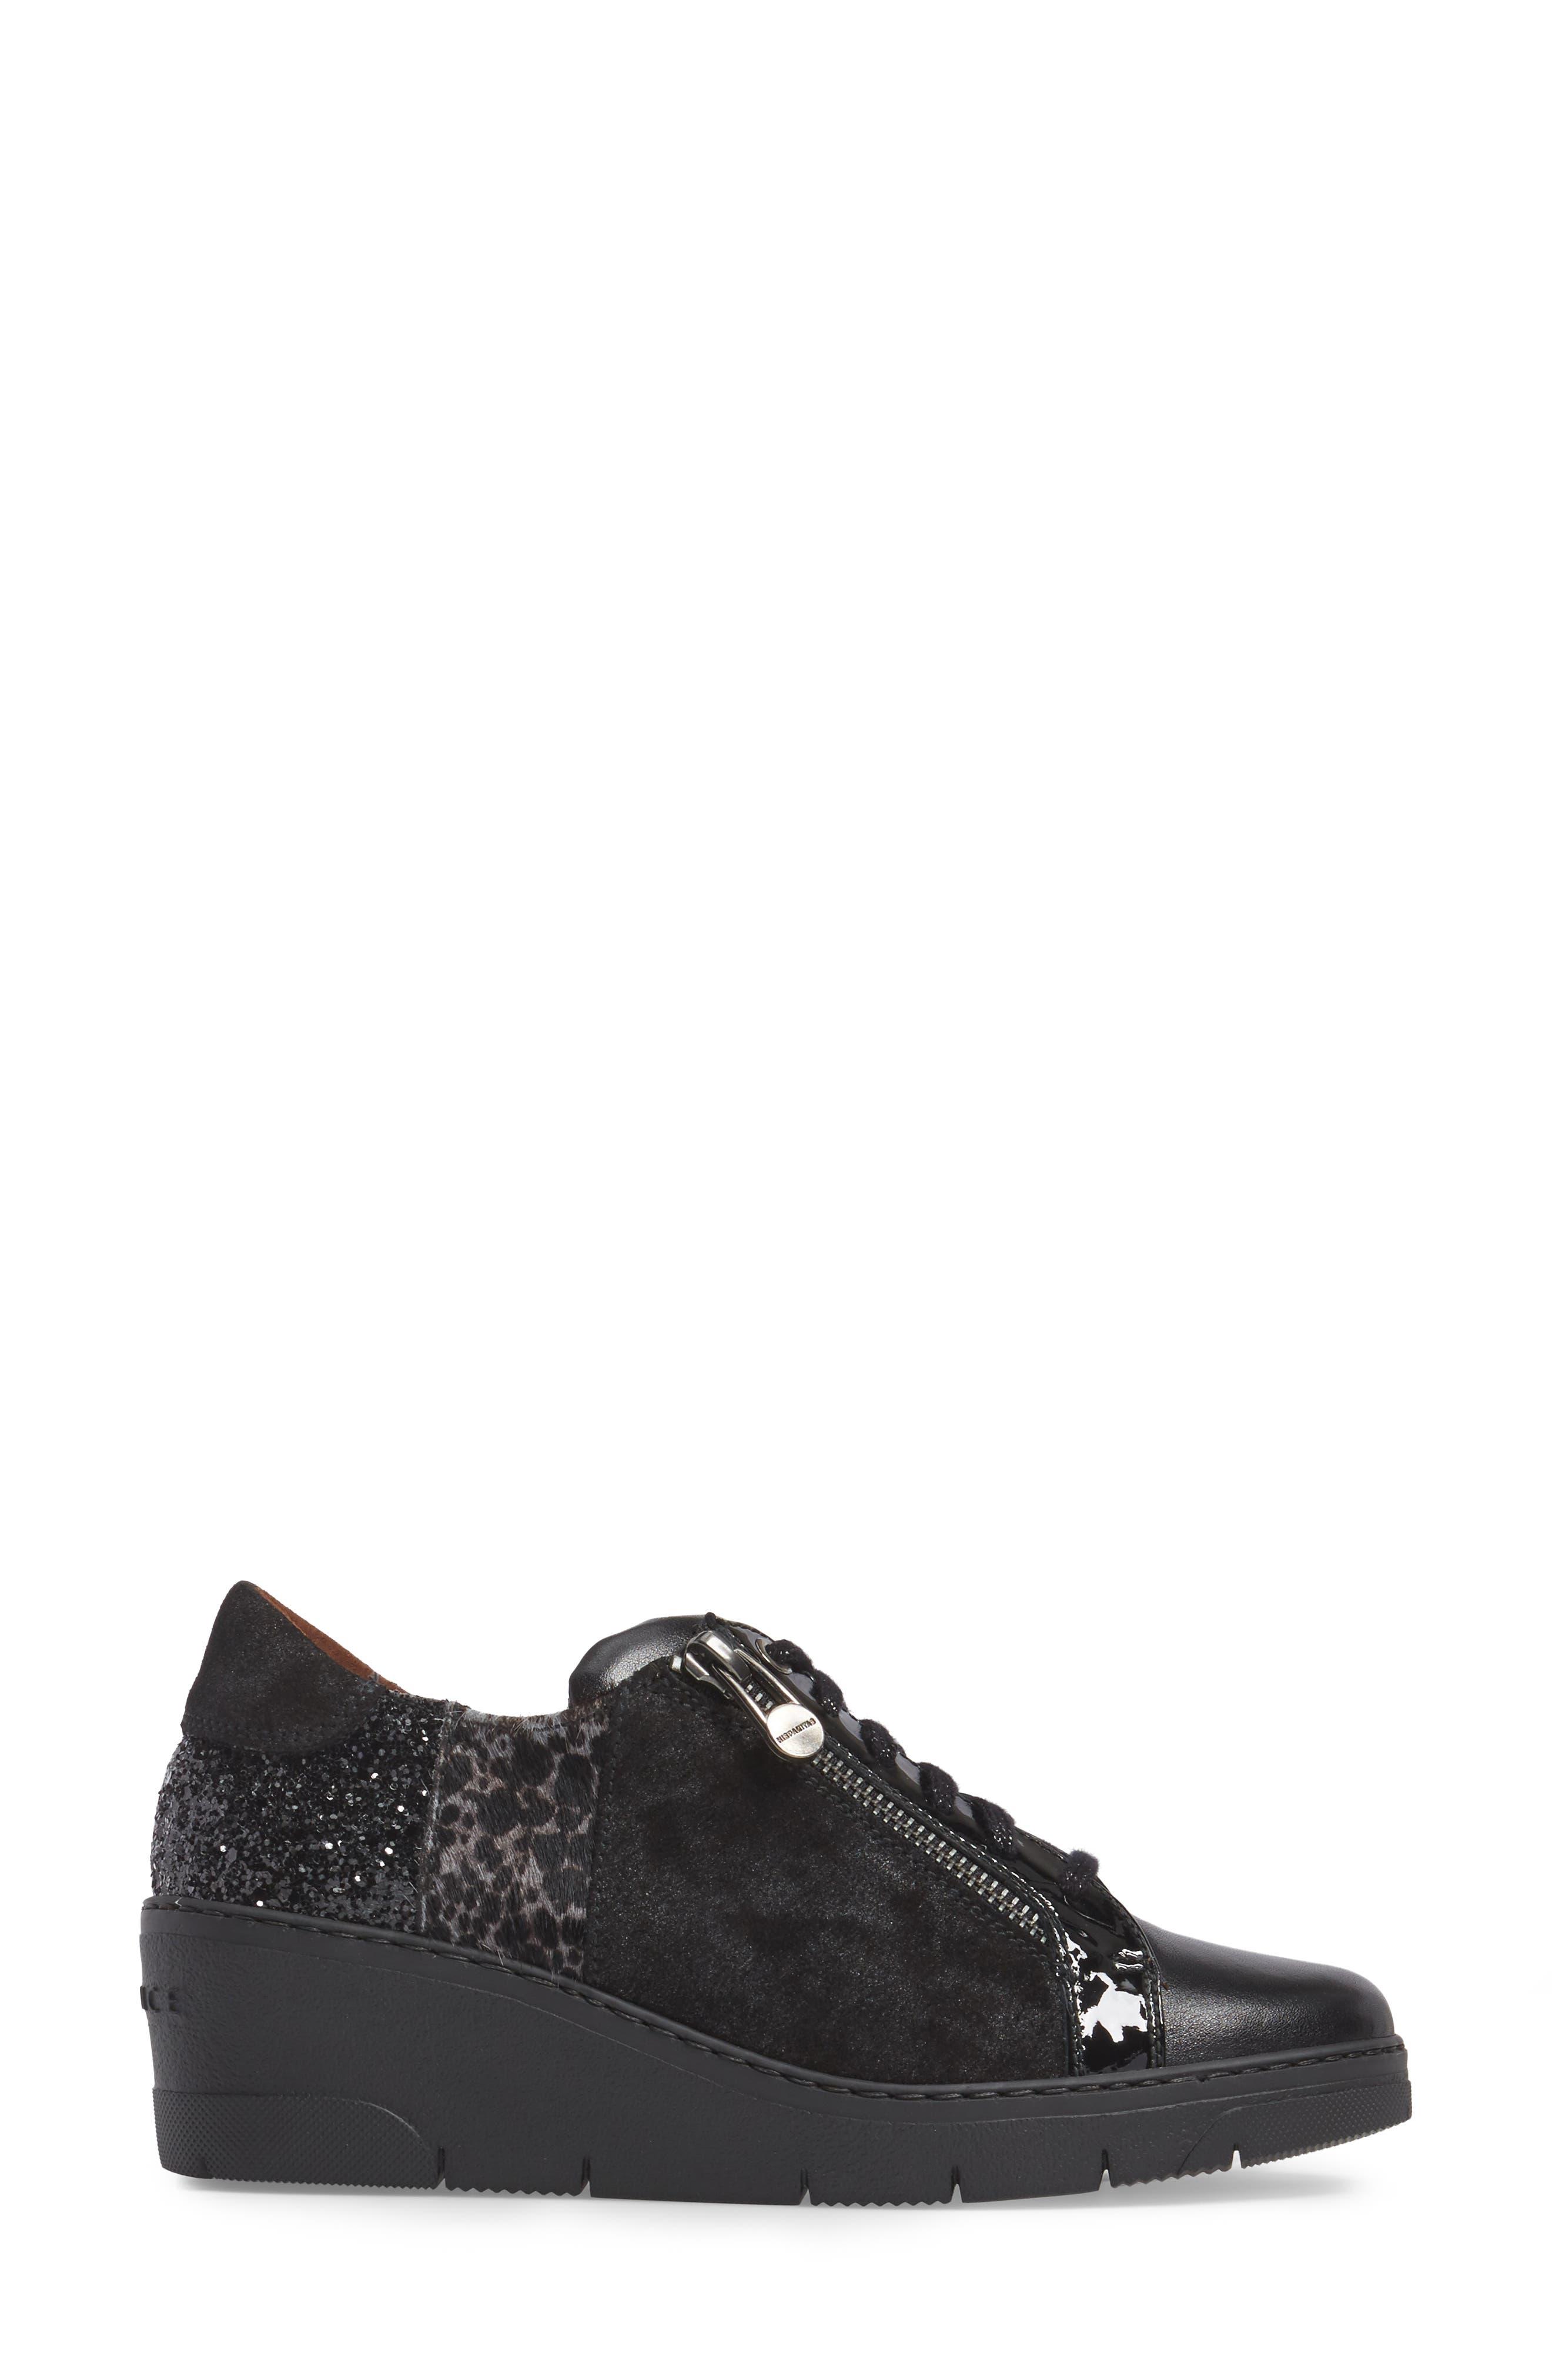 Sammi Sneaker,                             Alternate thumbnail 3, color,                             001